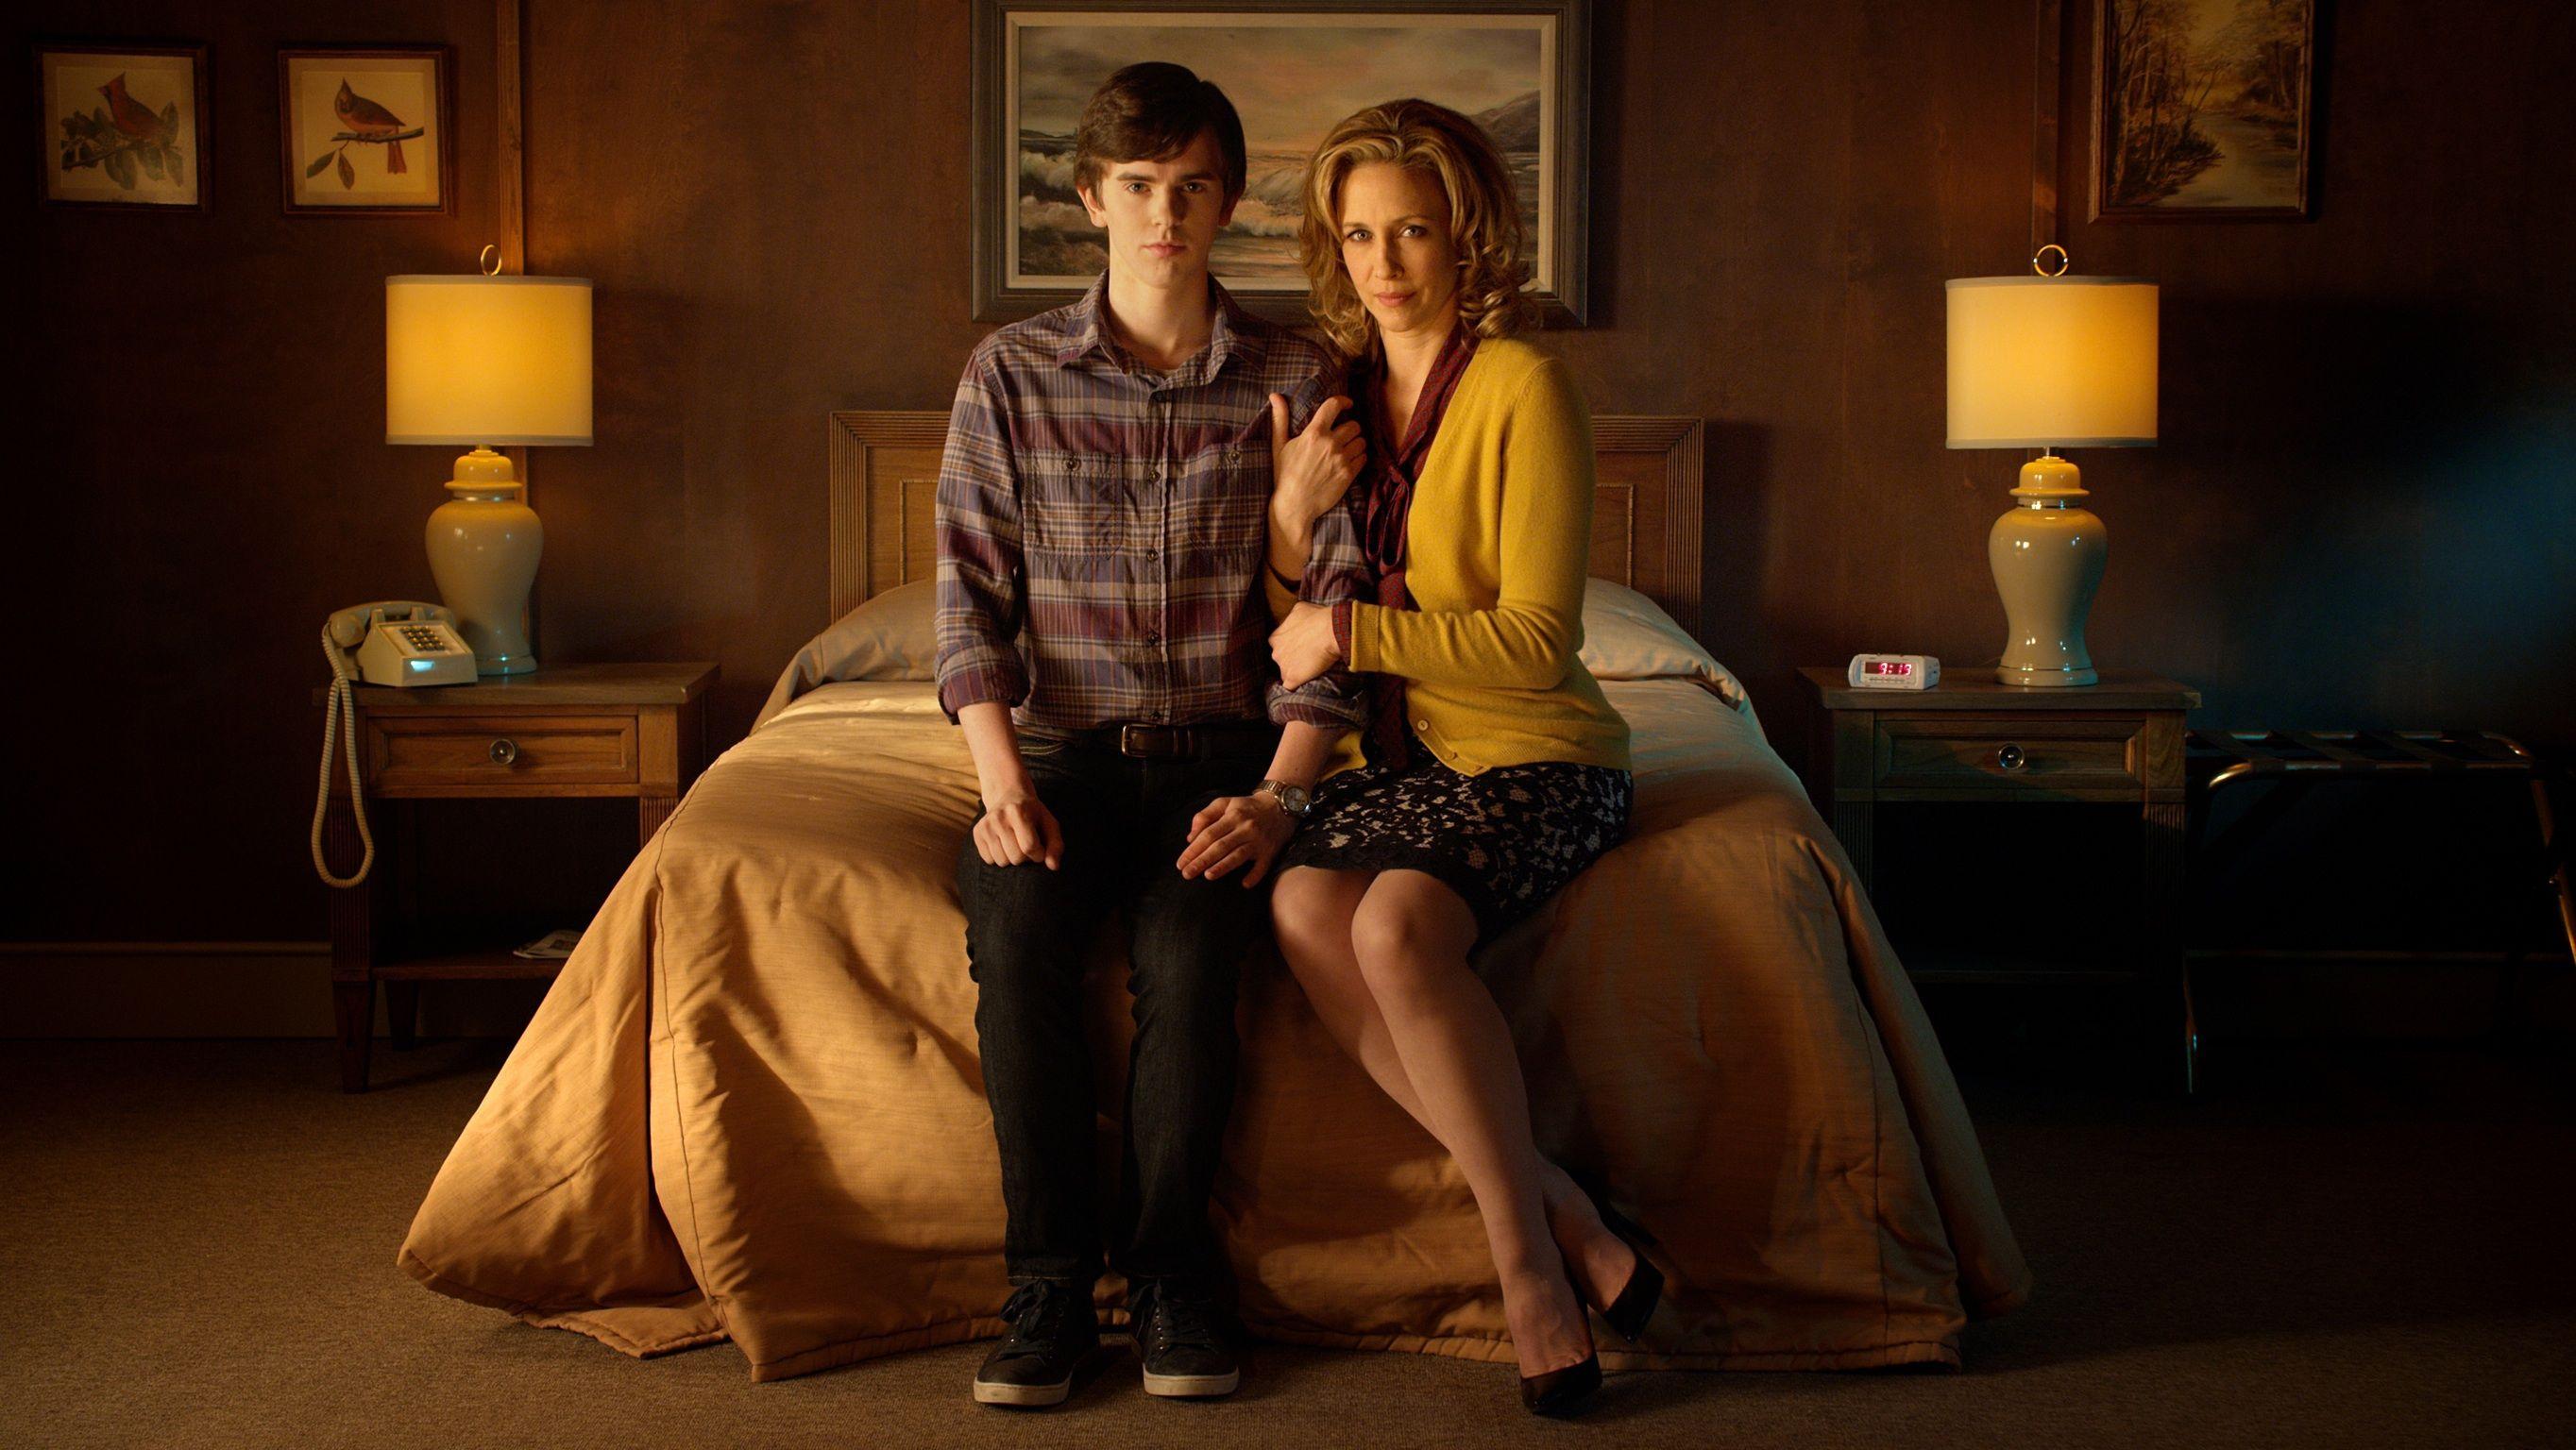 The cast of A&E's Bates Motel